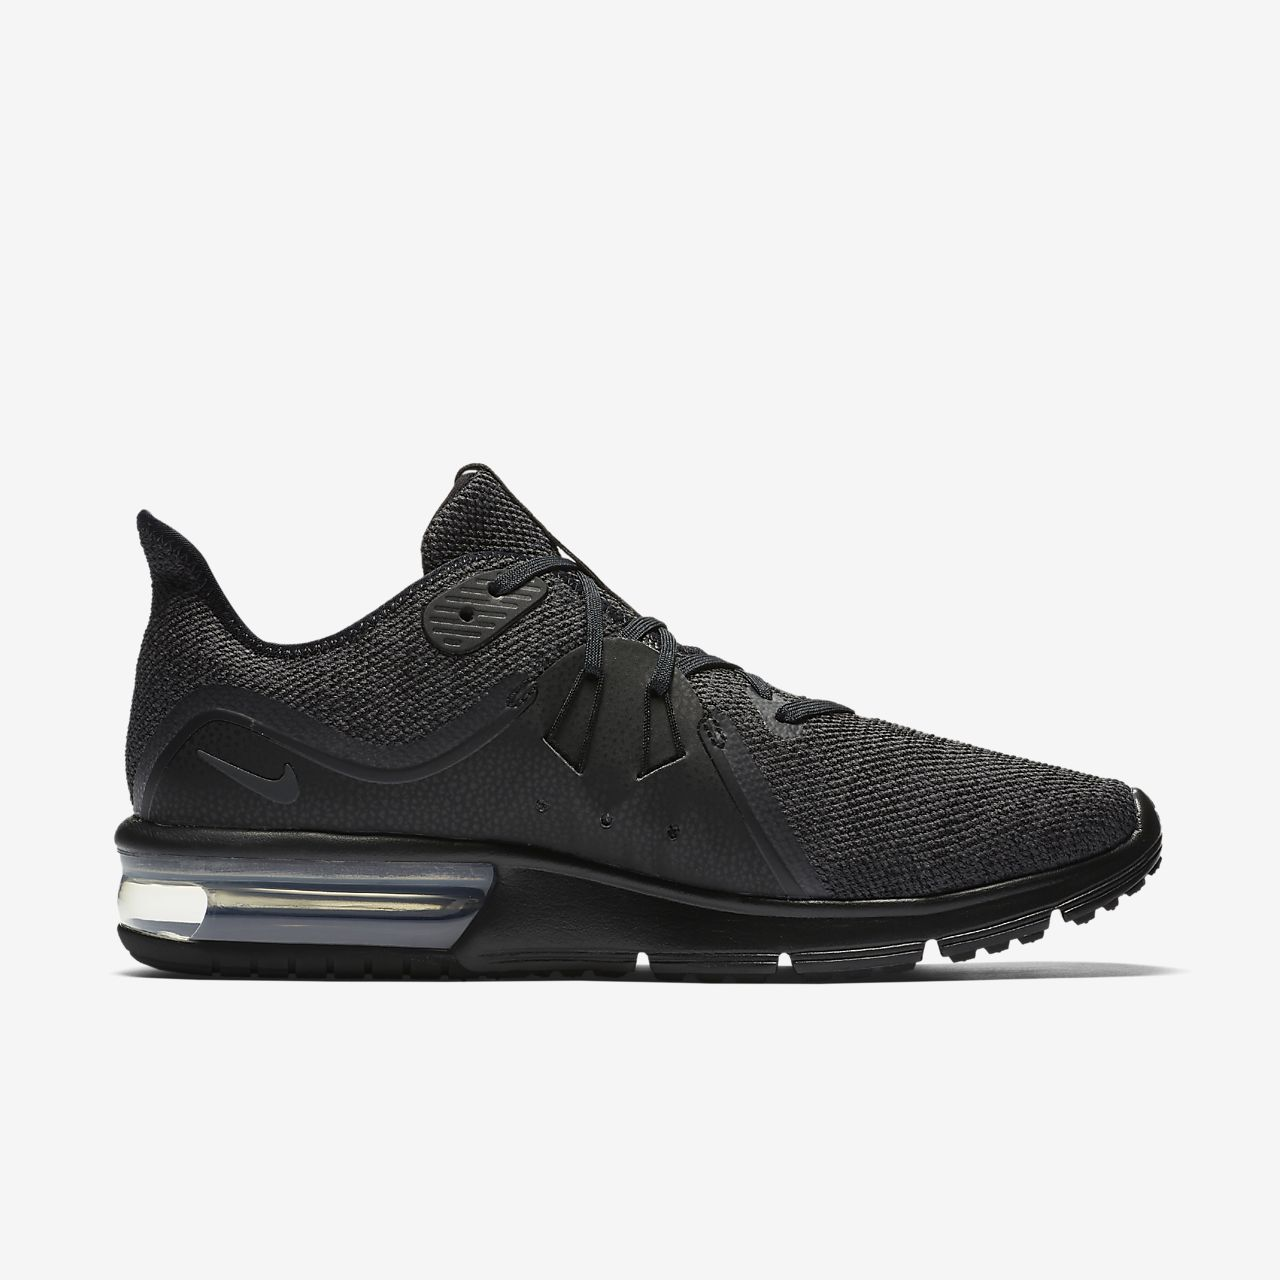 89cdf997a422a4 Vert Nike Air Pegasus Chaussures Chaussures Chaussures Pour Hommes ...